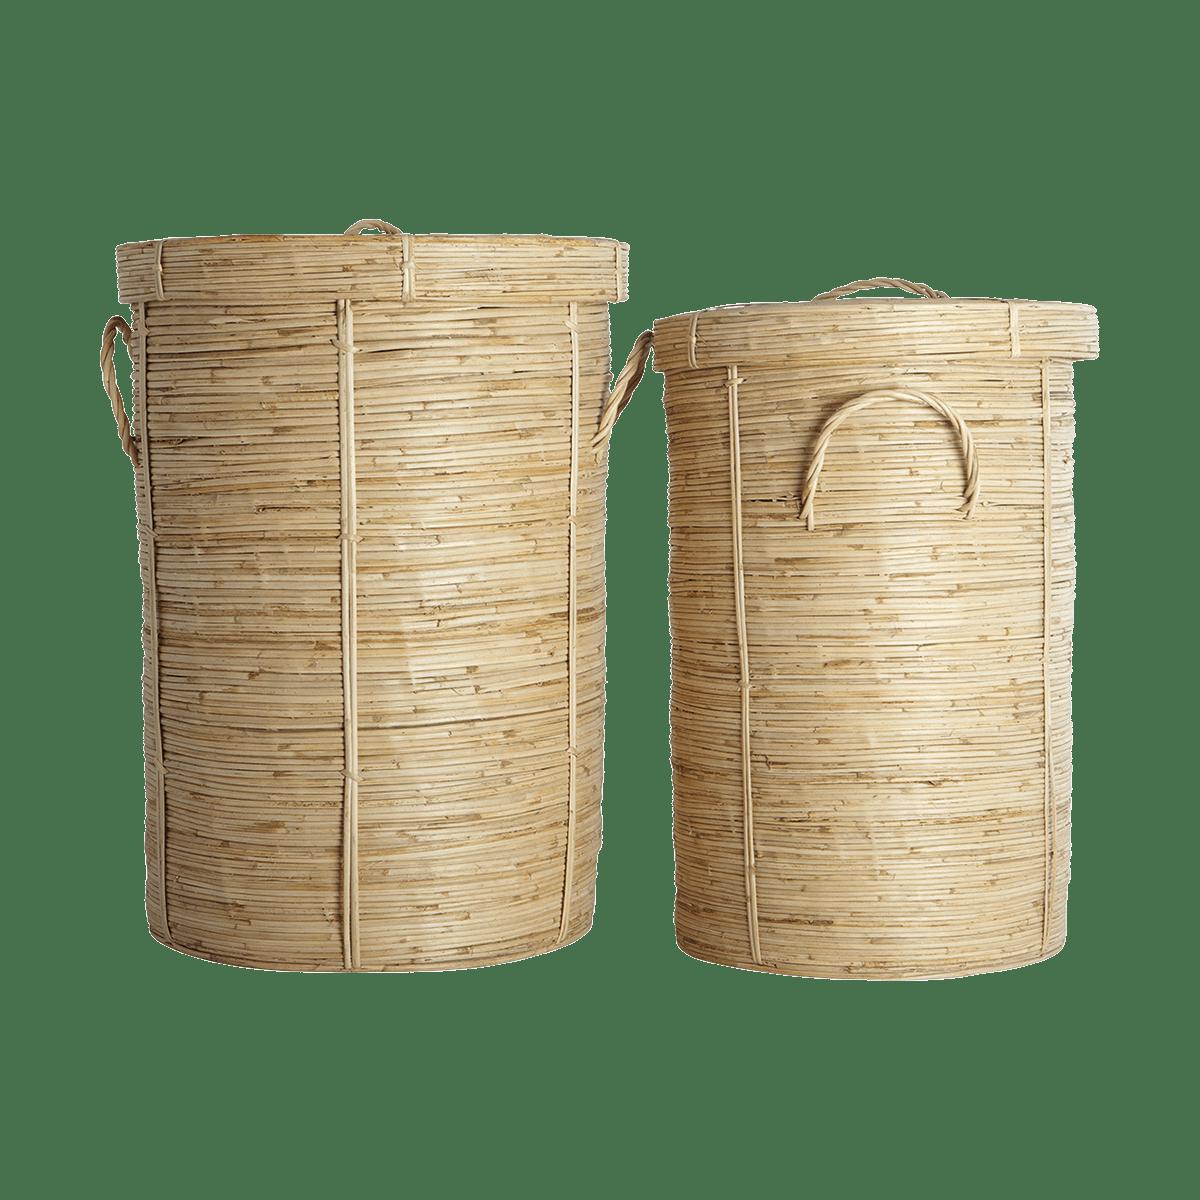 Koše na prádlo Chaka – sada 2 kusů